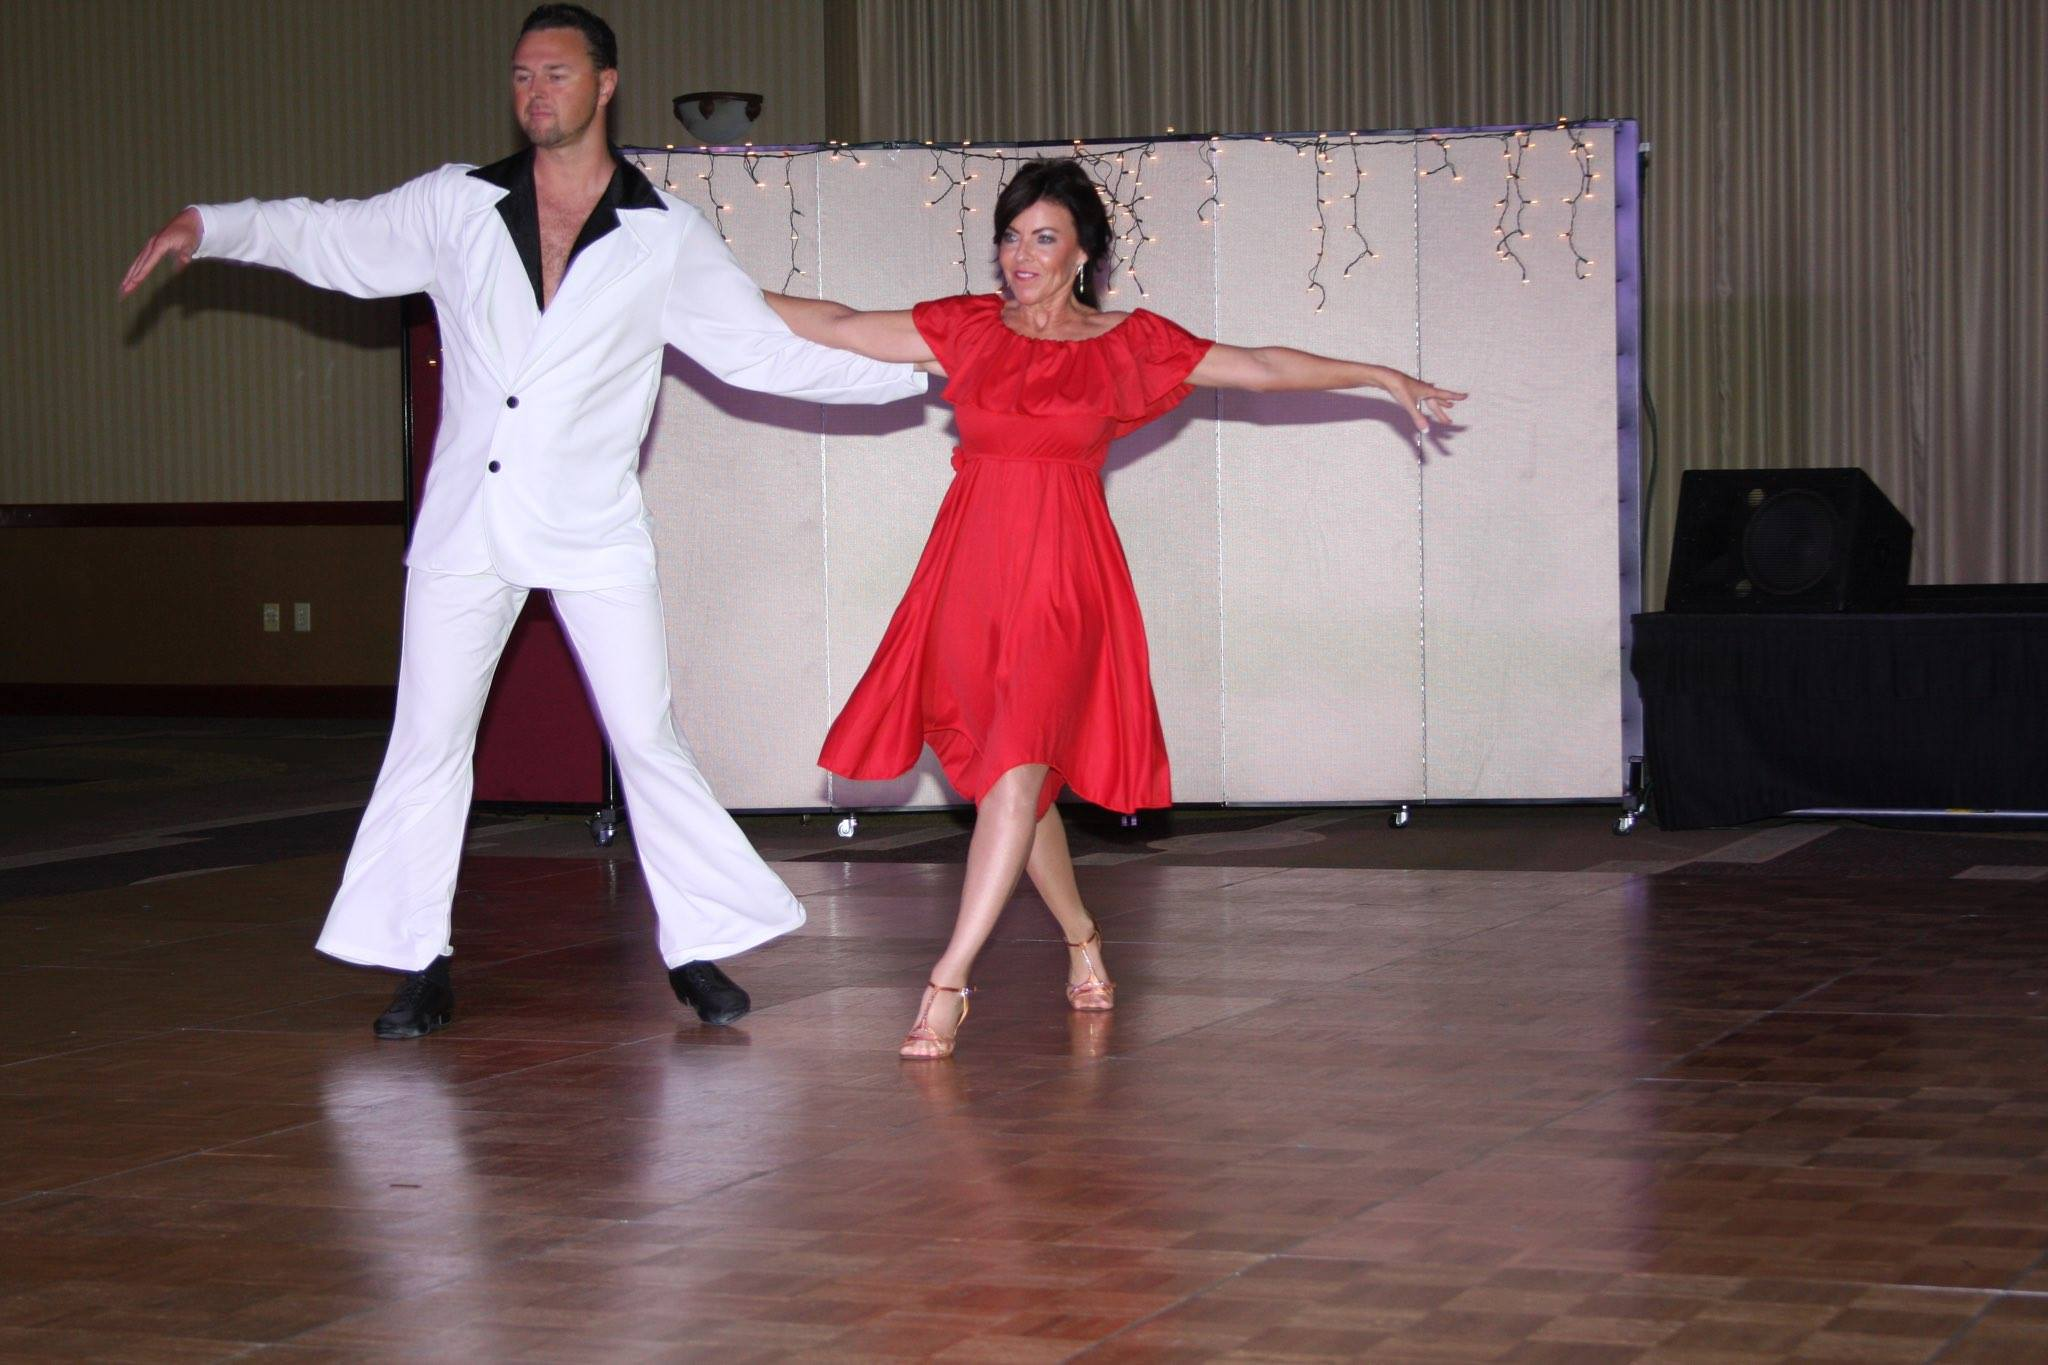 ballroom dance classes lessons